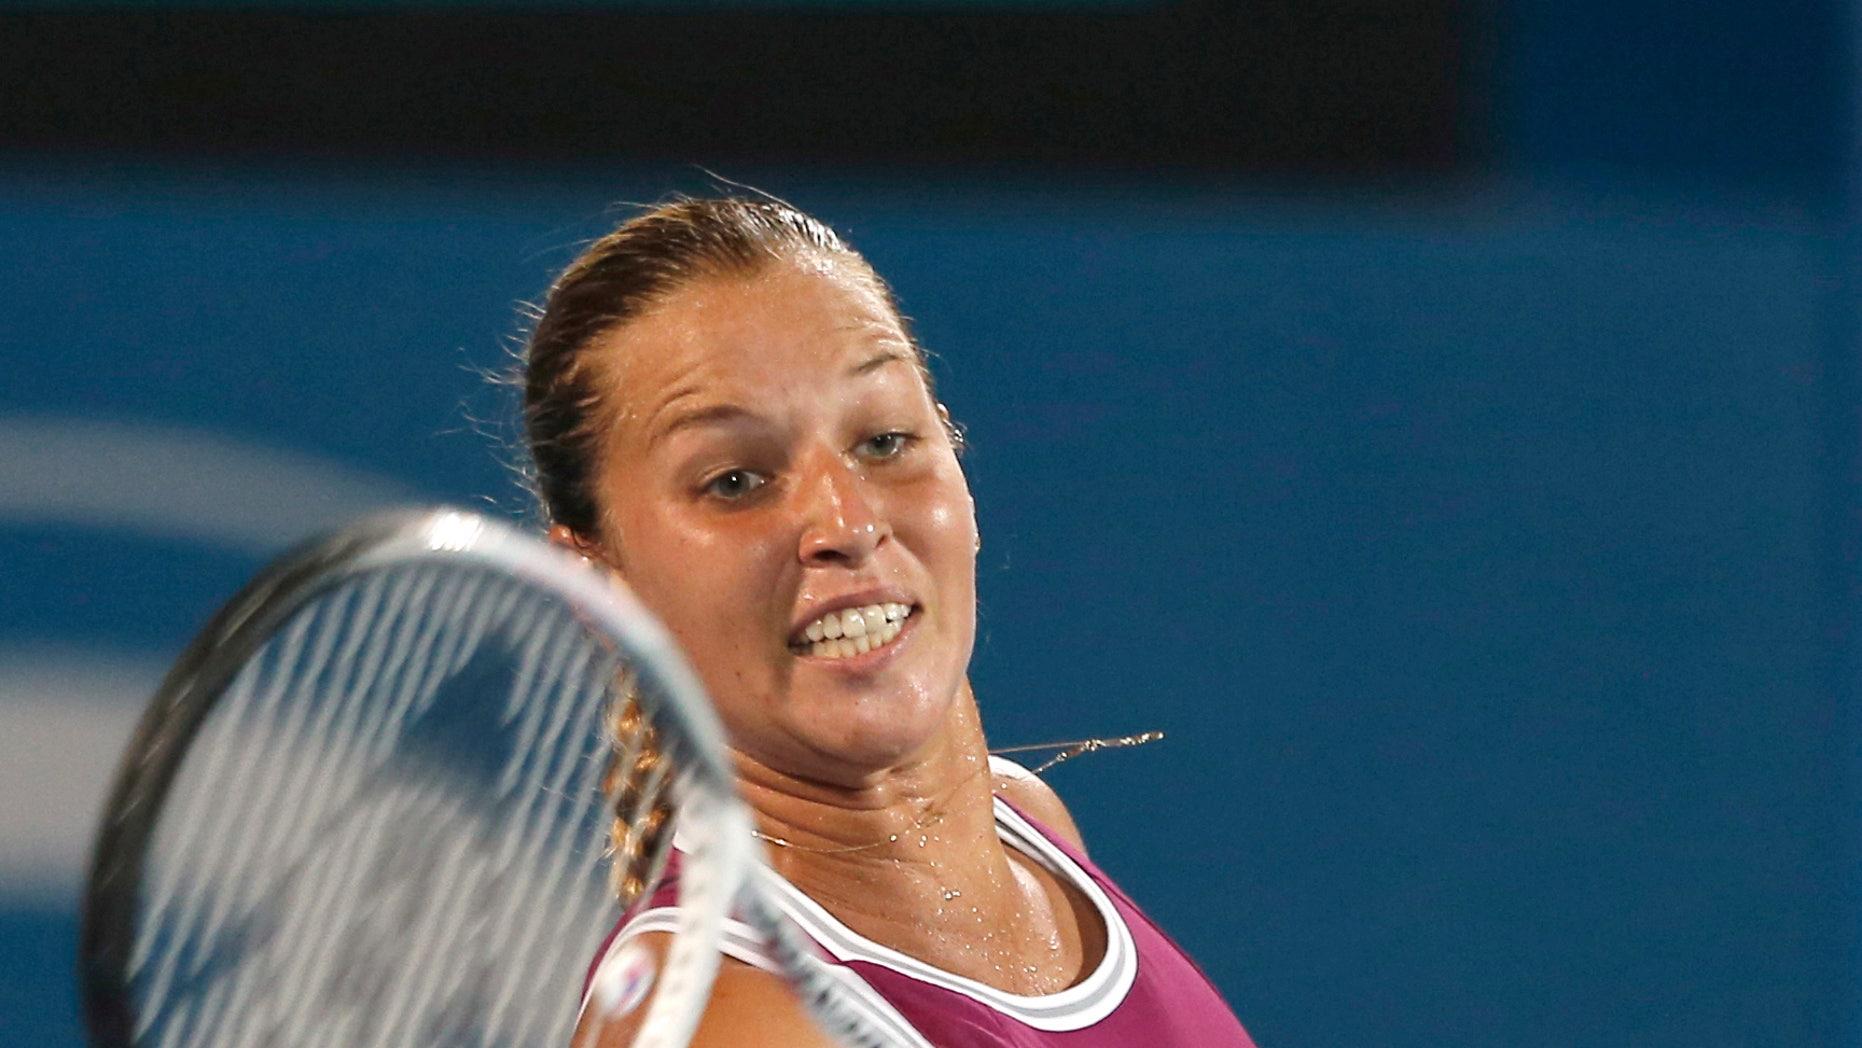 Slovakia's Dominika Cibulkova returns a shot to Poland's Agnieszka Radwanska during the women's final of the Sydney International tennis tournament in Sydney, Australia, Friday, Jan. 11, 2013. Radwanska won the match 6-0, 6-0. (AP Photo/Rob Griffith)